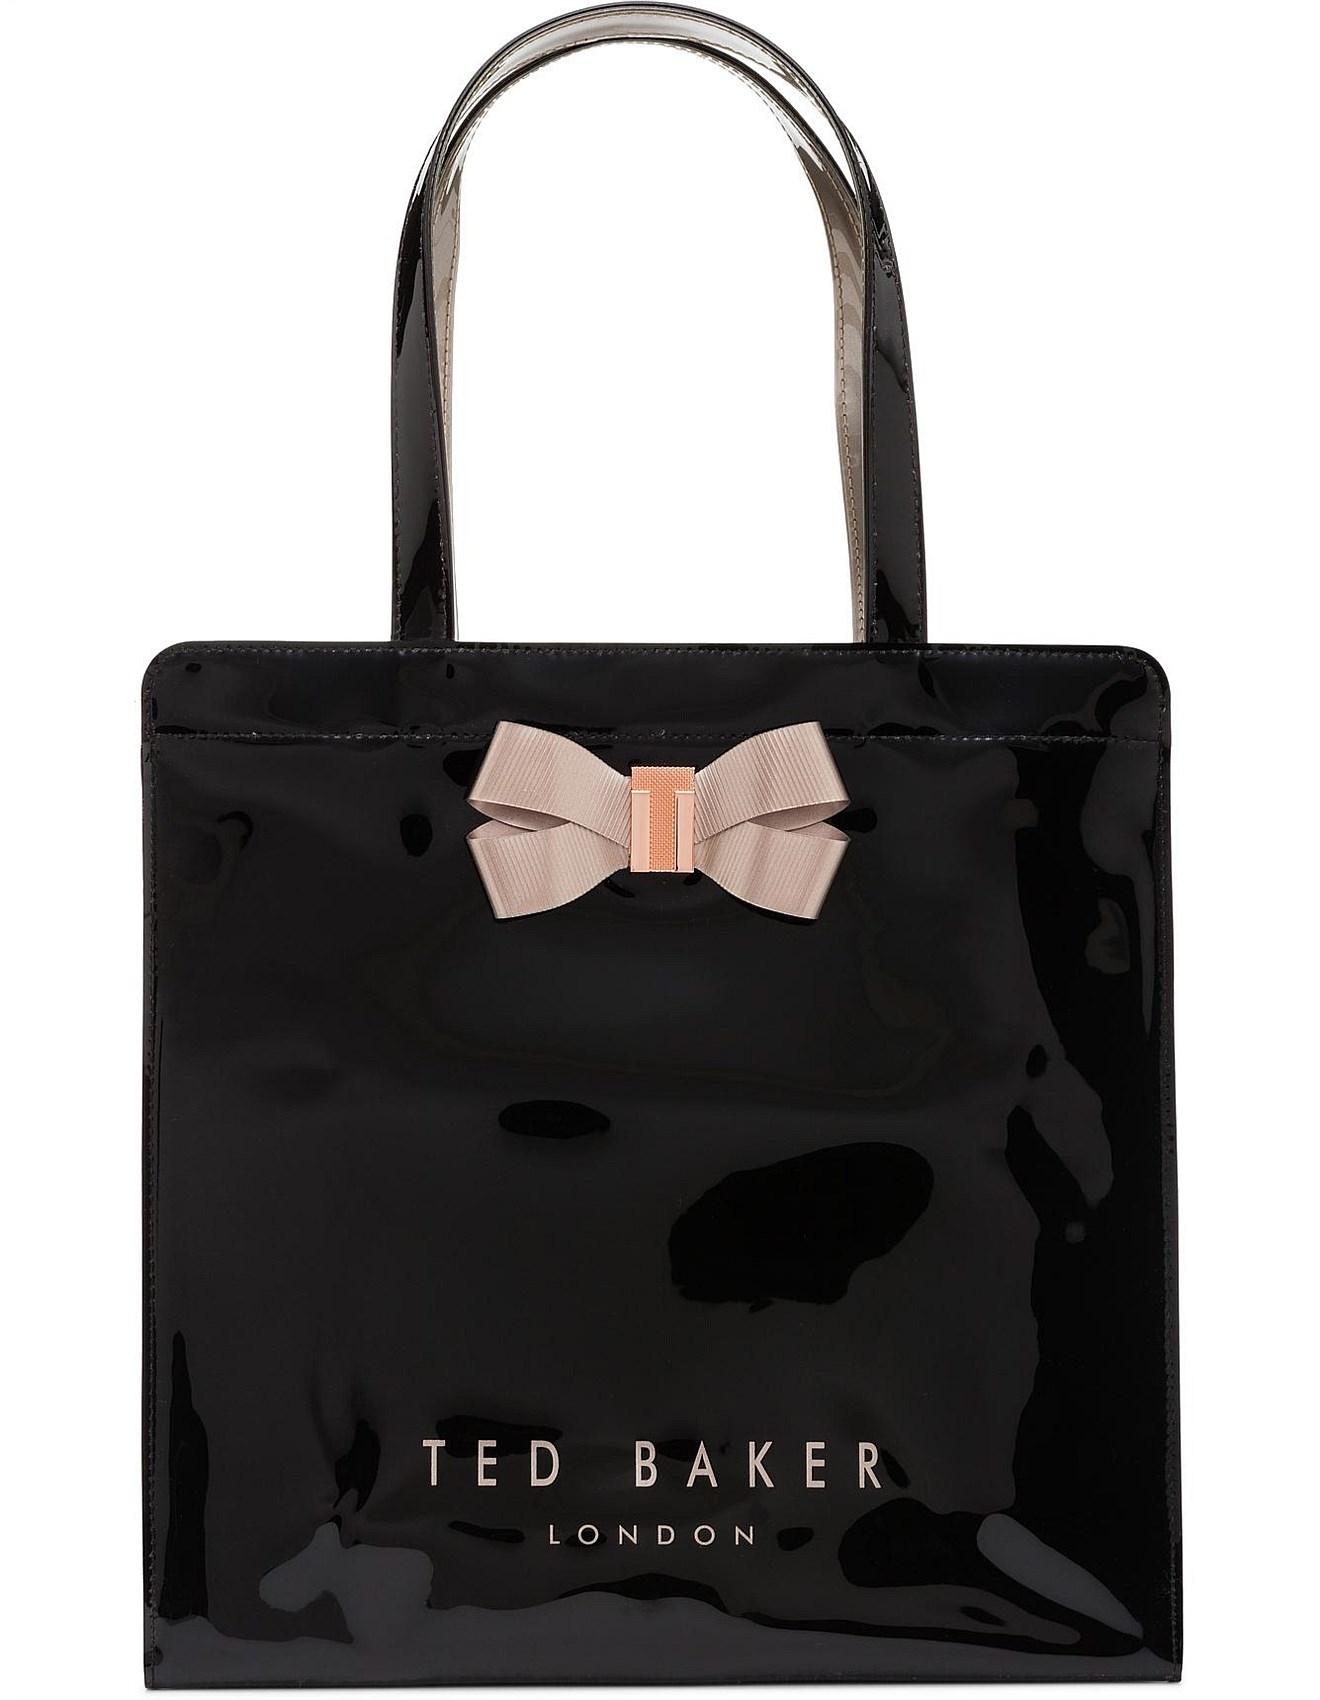 women 39 s tote bags buy women 39 s handbags online david jones core large bow icon. Black Bedroom Furniture Sets. Home Design Ideas